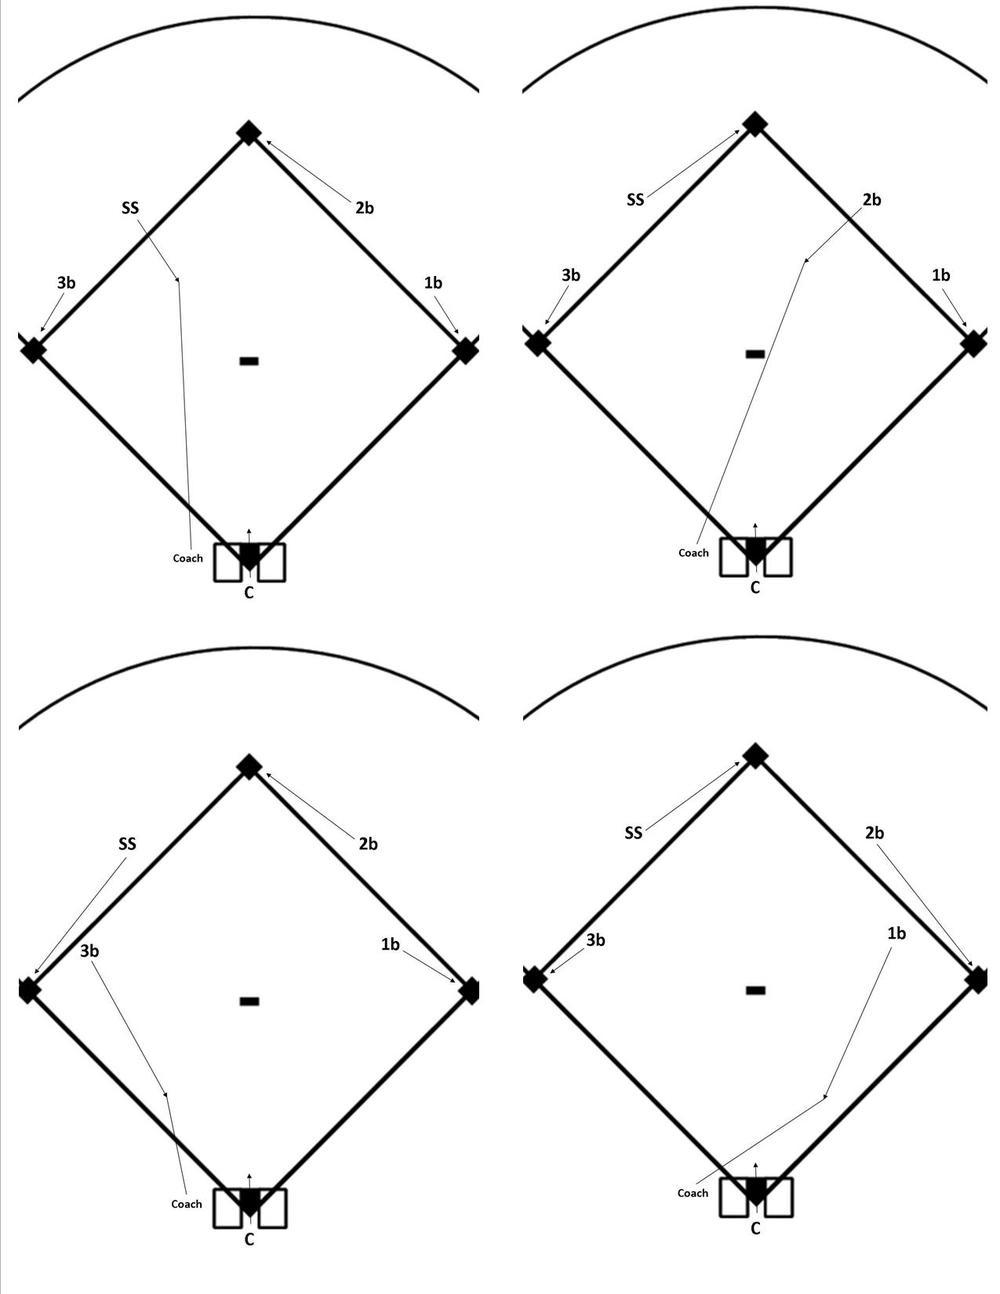 fastpitch softball field diagram